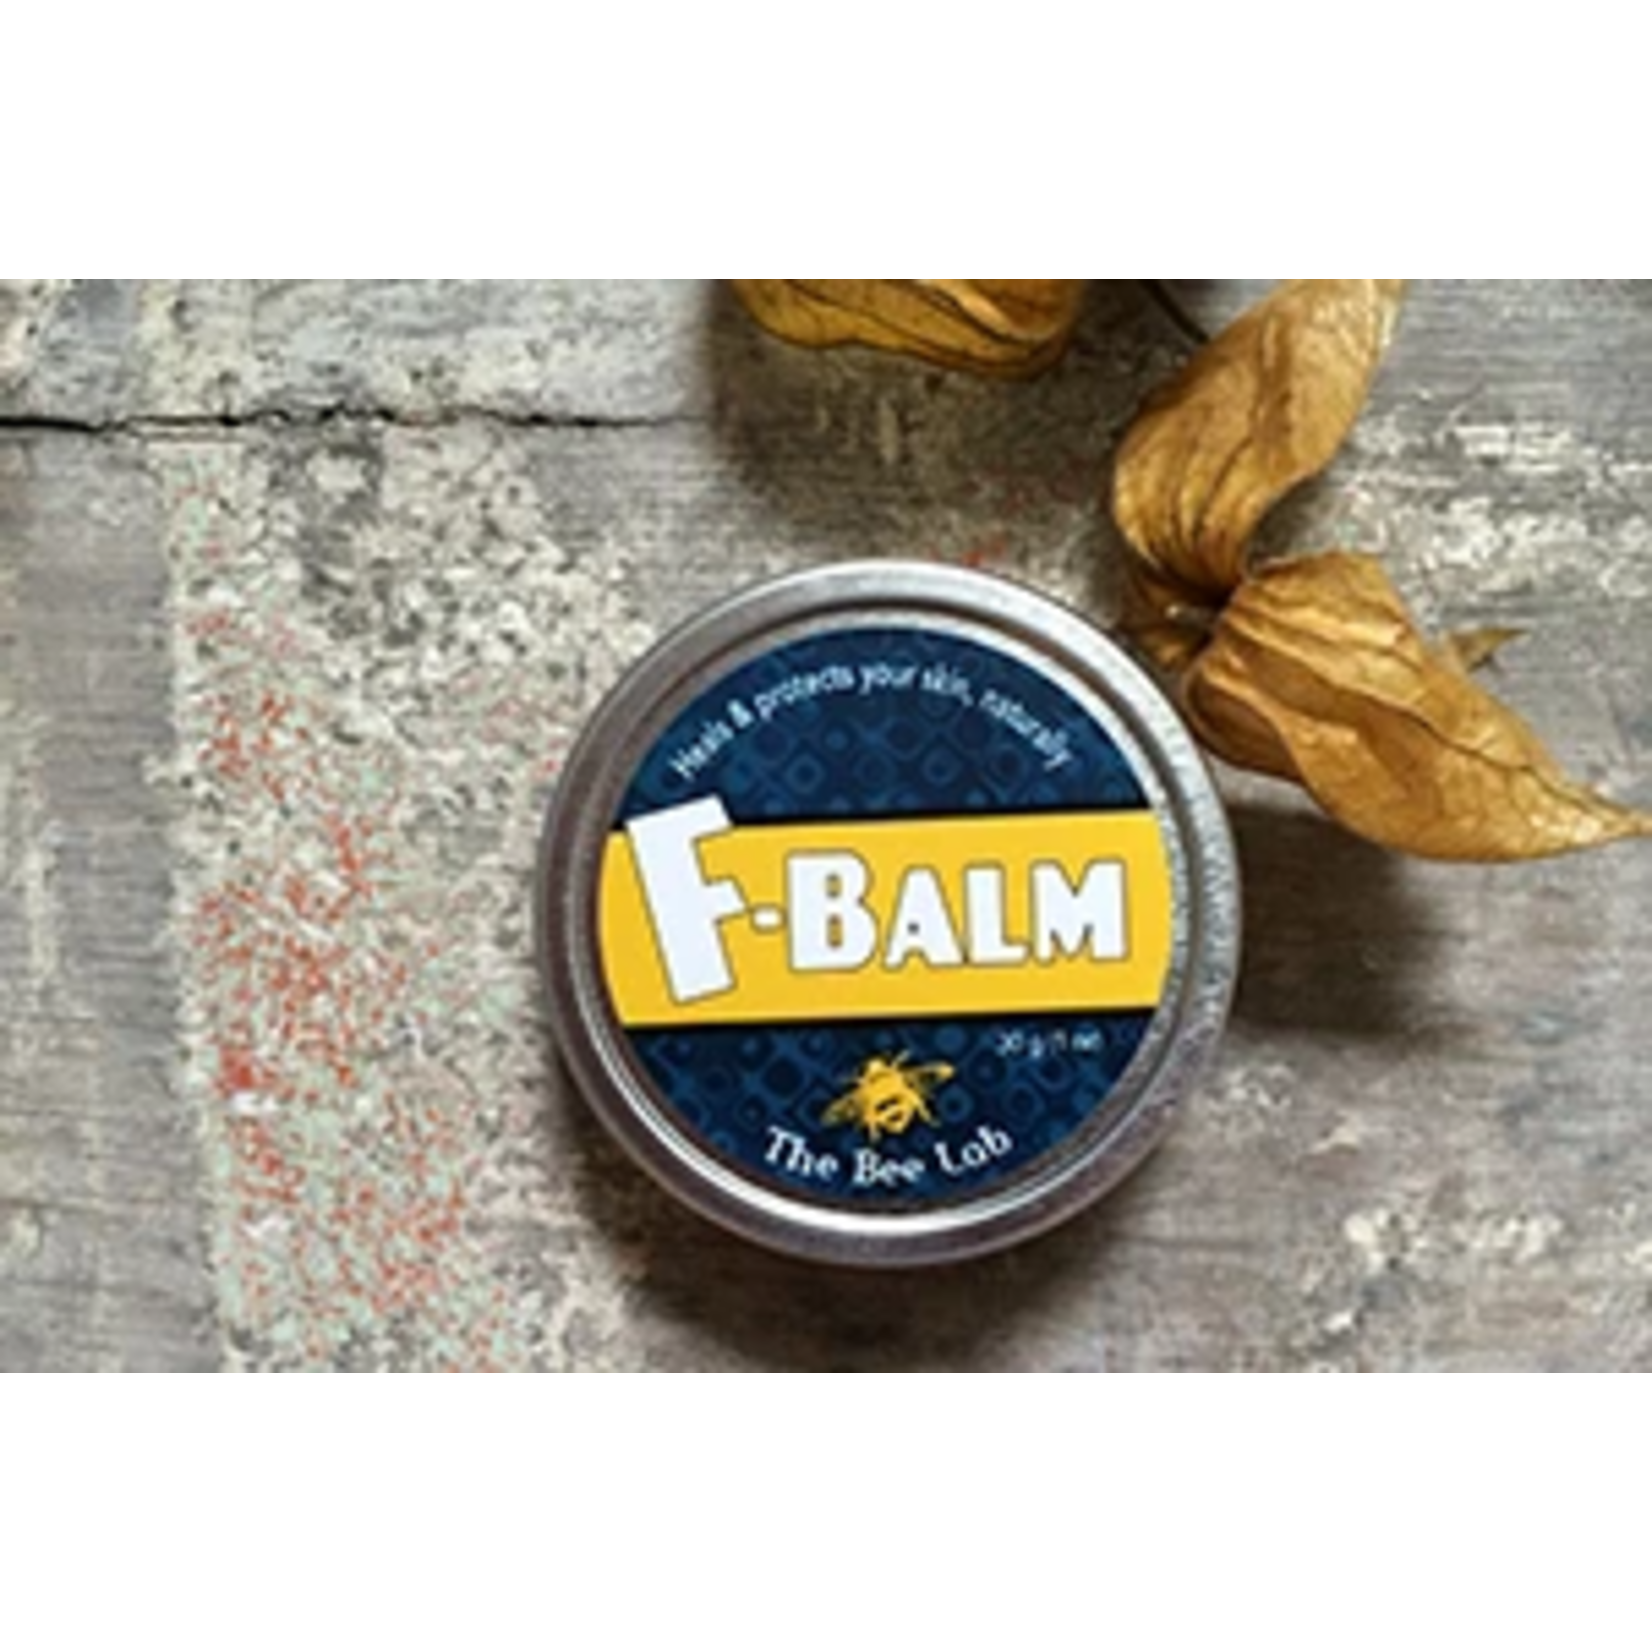 The bee Lab F-Balm regular Scent